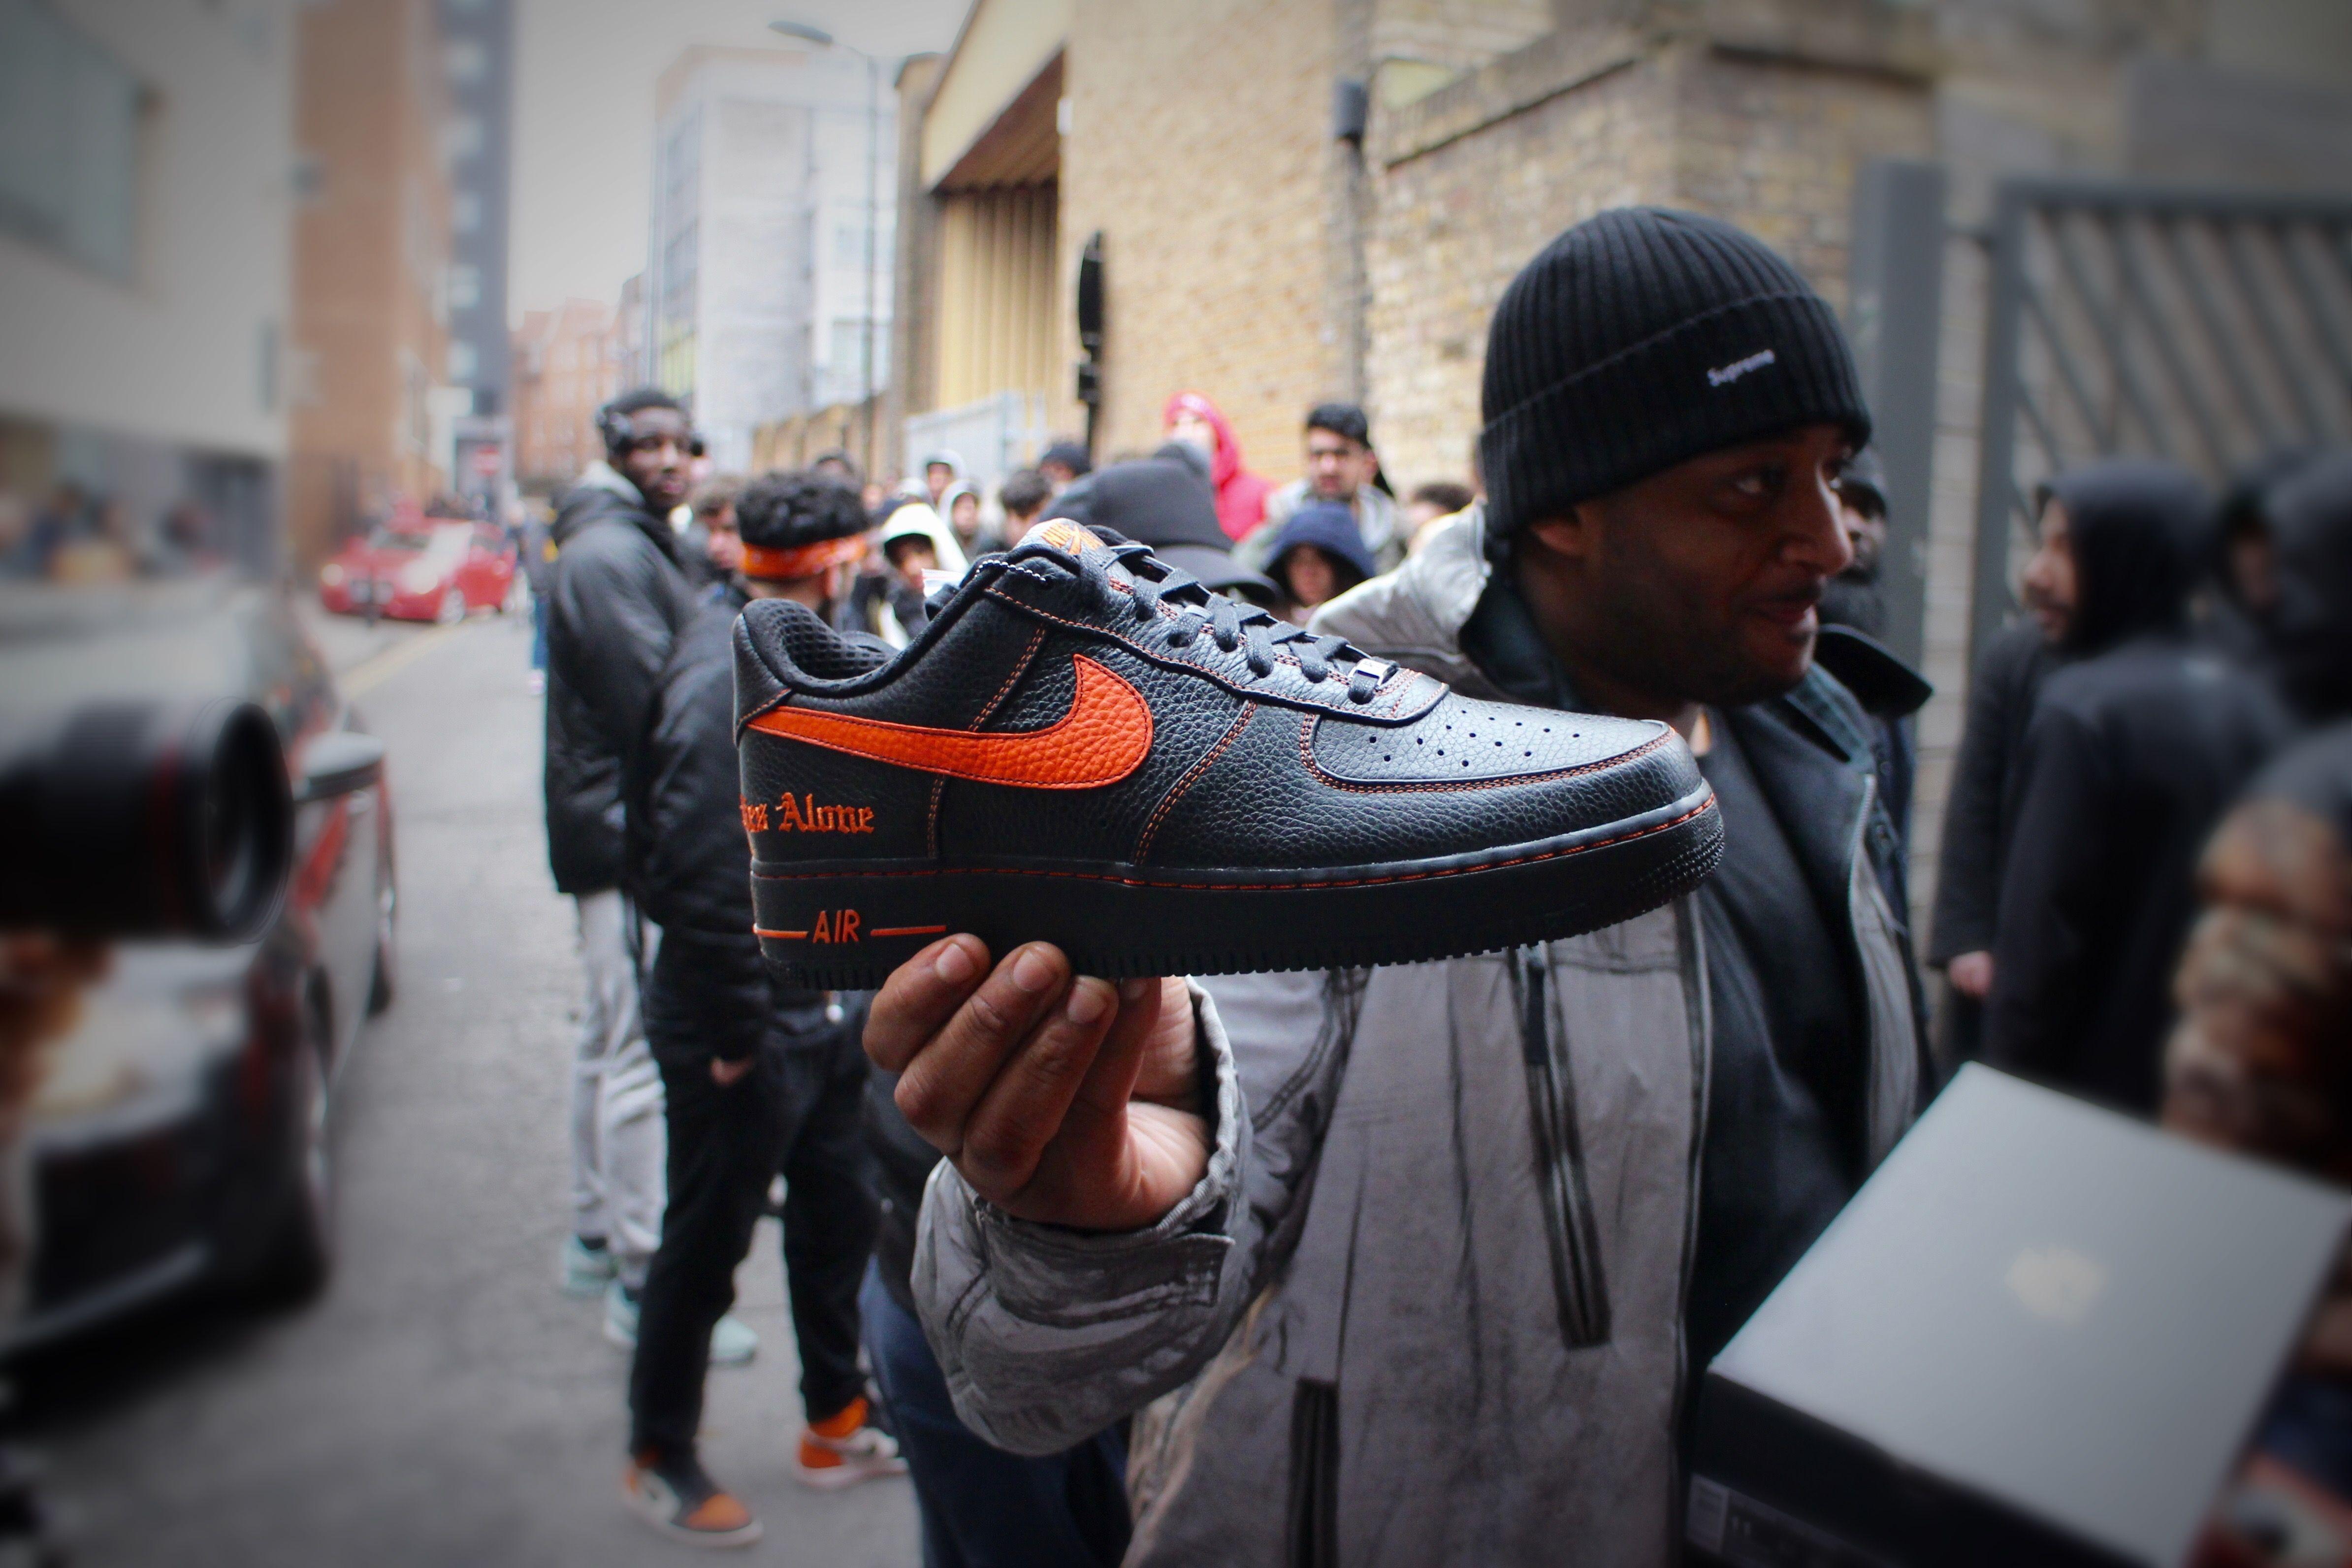 VLONE x Nike Air Force 1 London Drop Release Recap